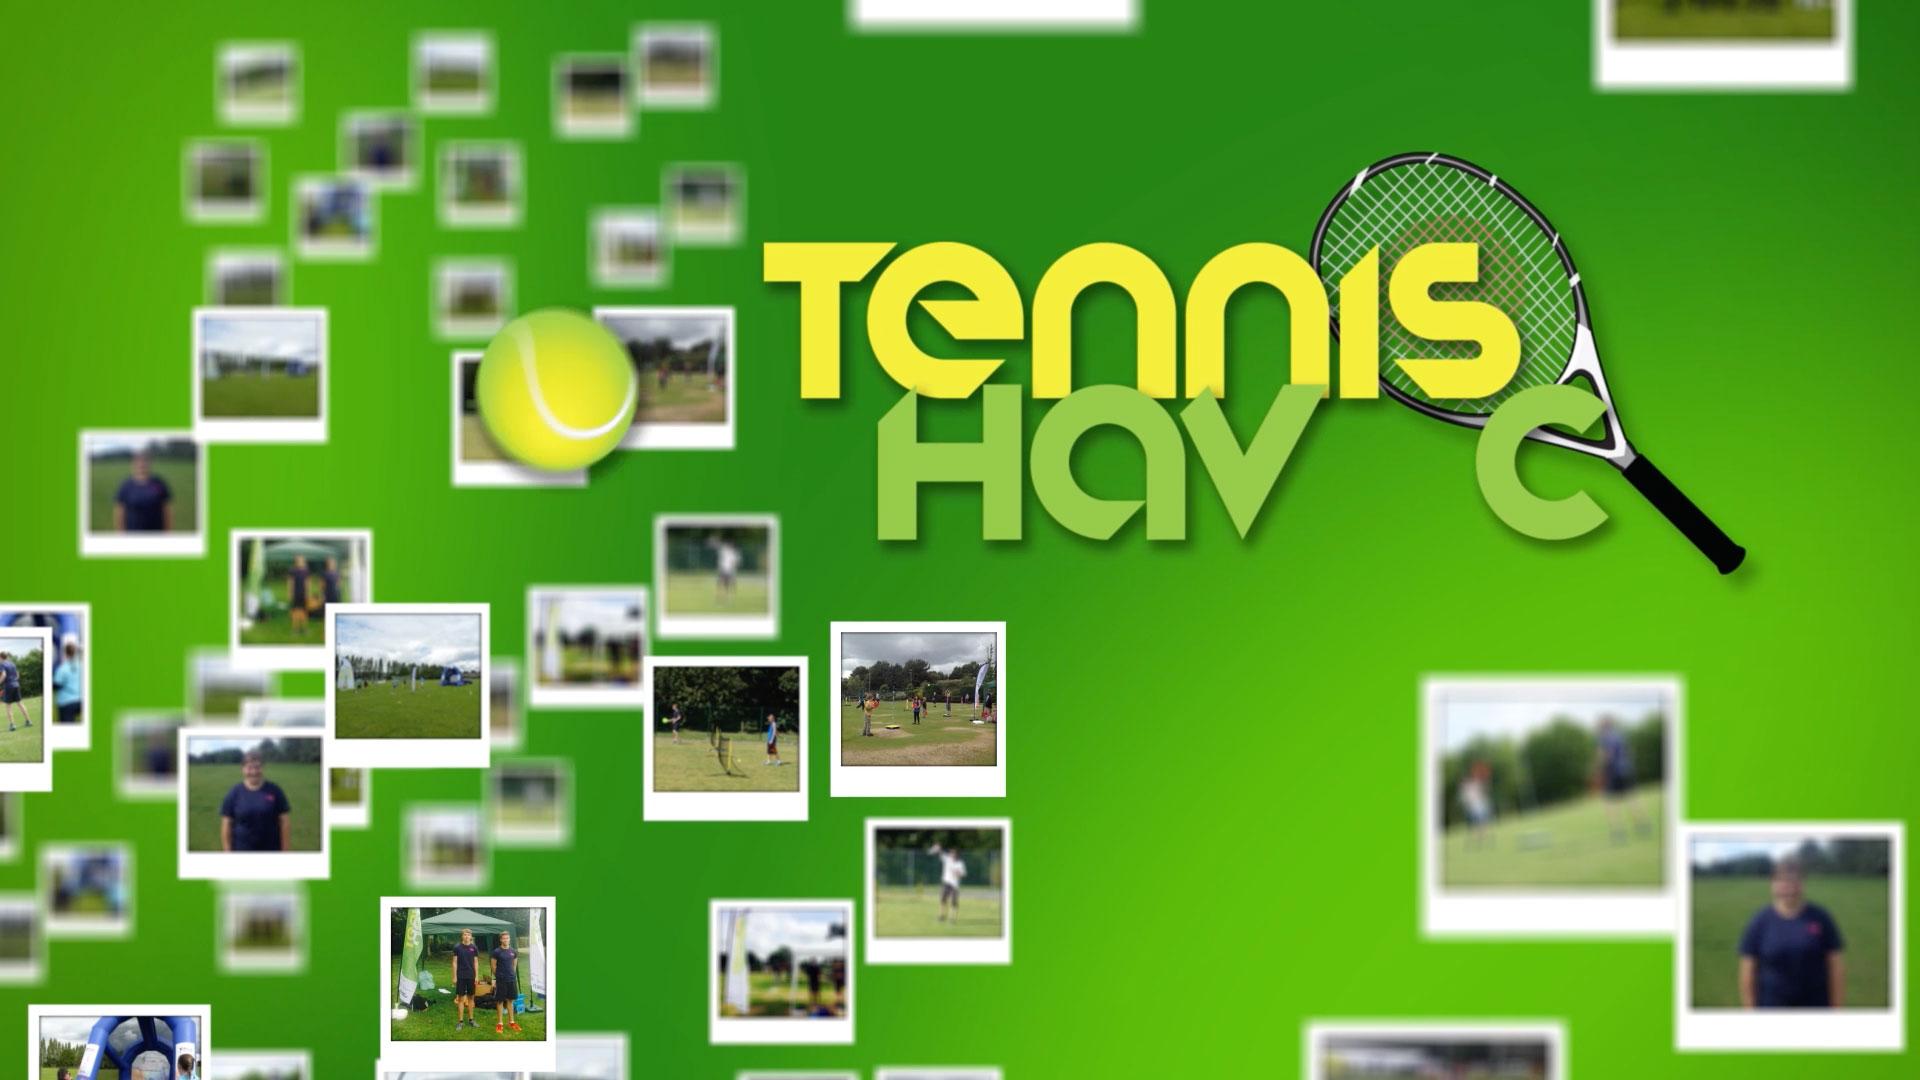 Tennis-Havoc-01.jpg